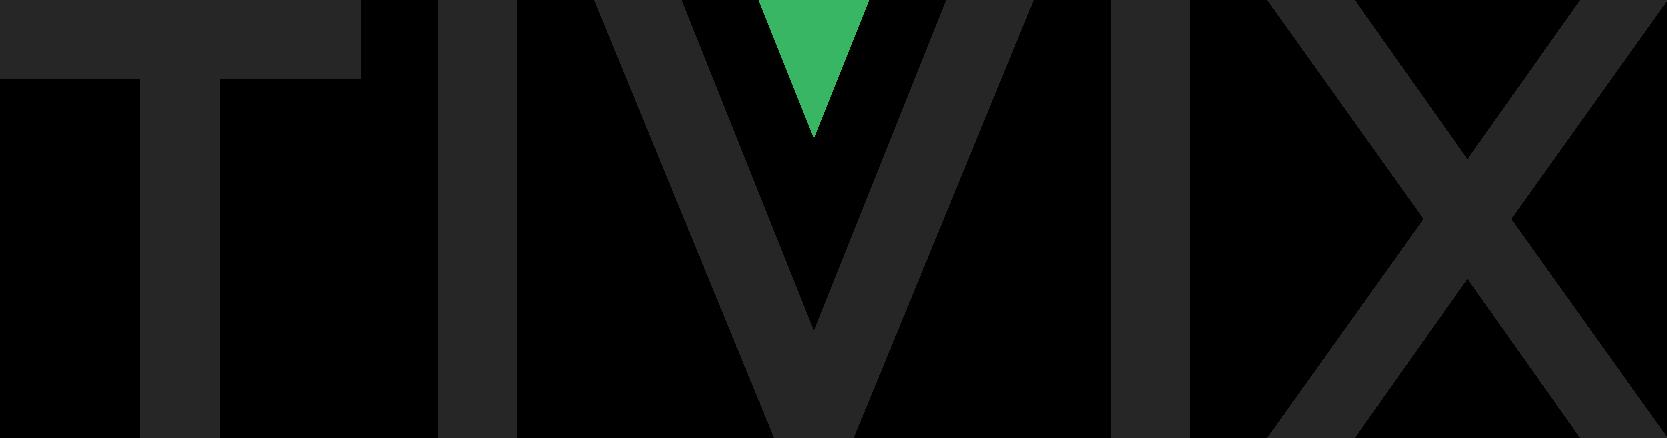 tivix web development company